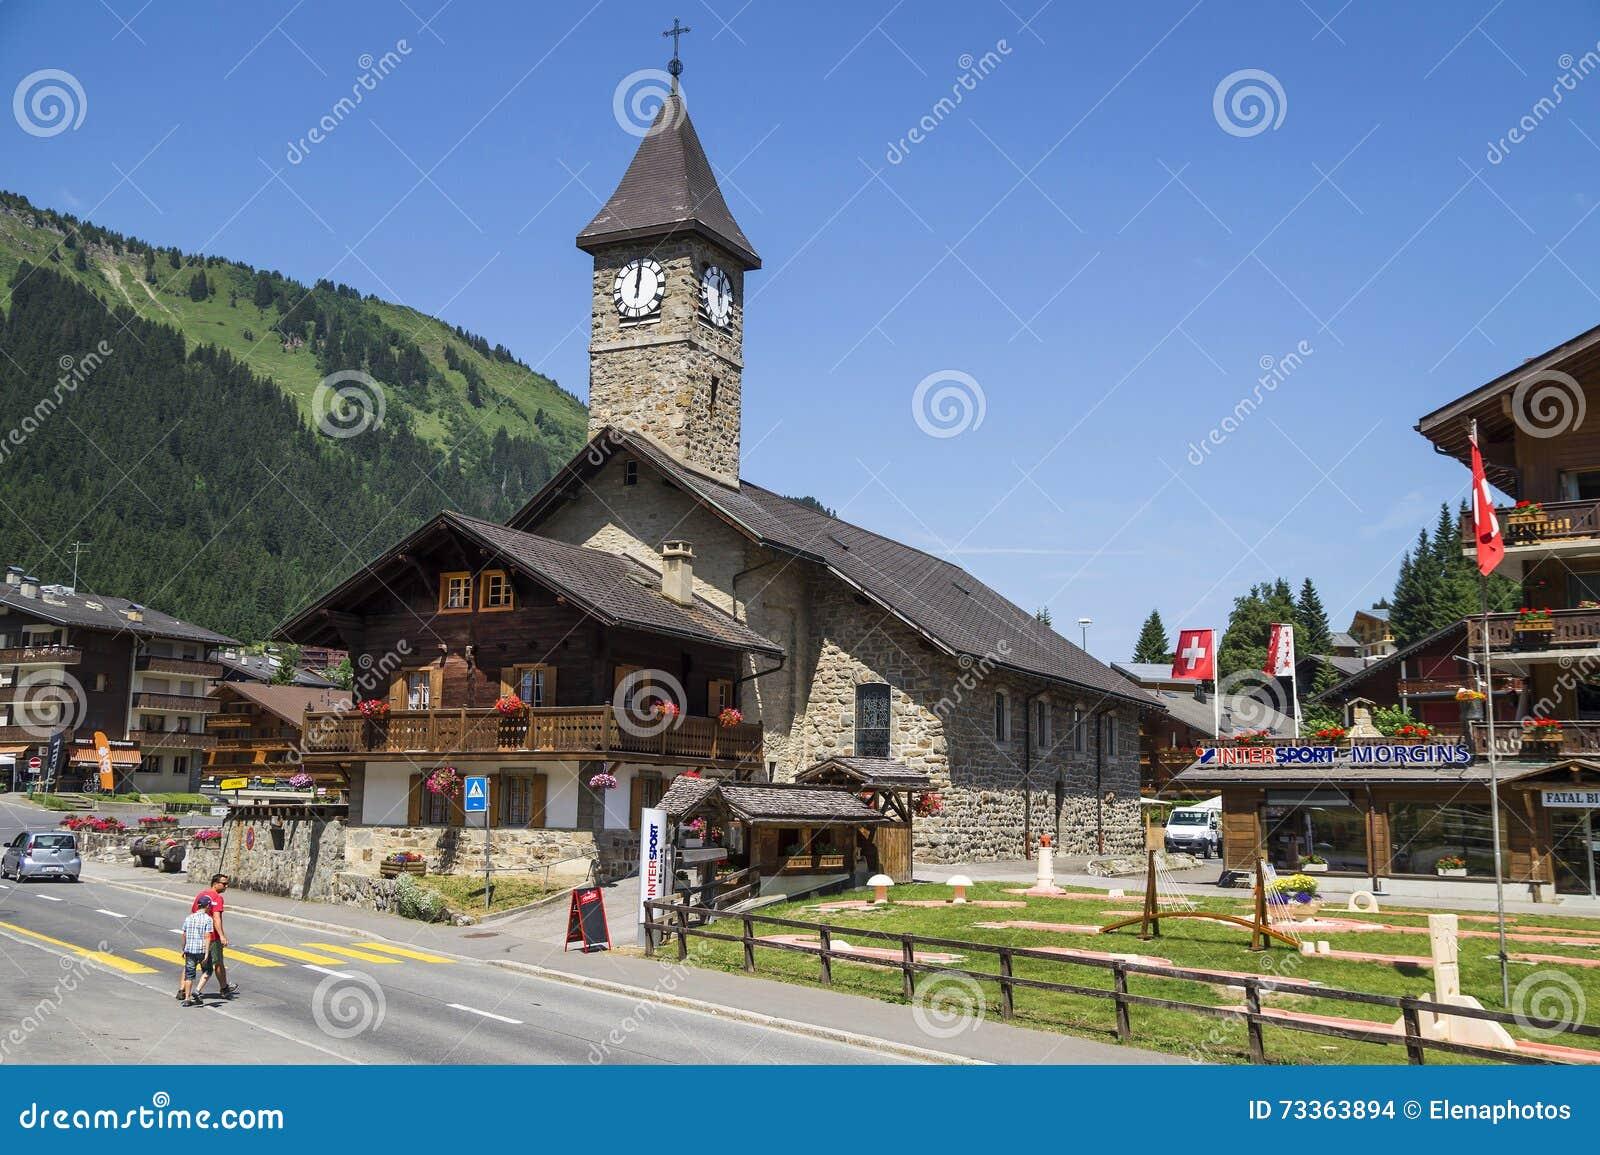 morgins village in the alps,switzerland editorial stock image